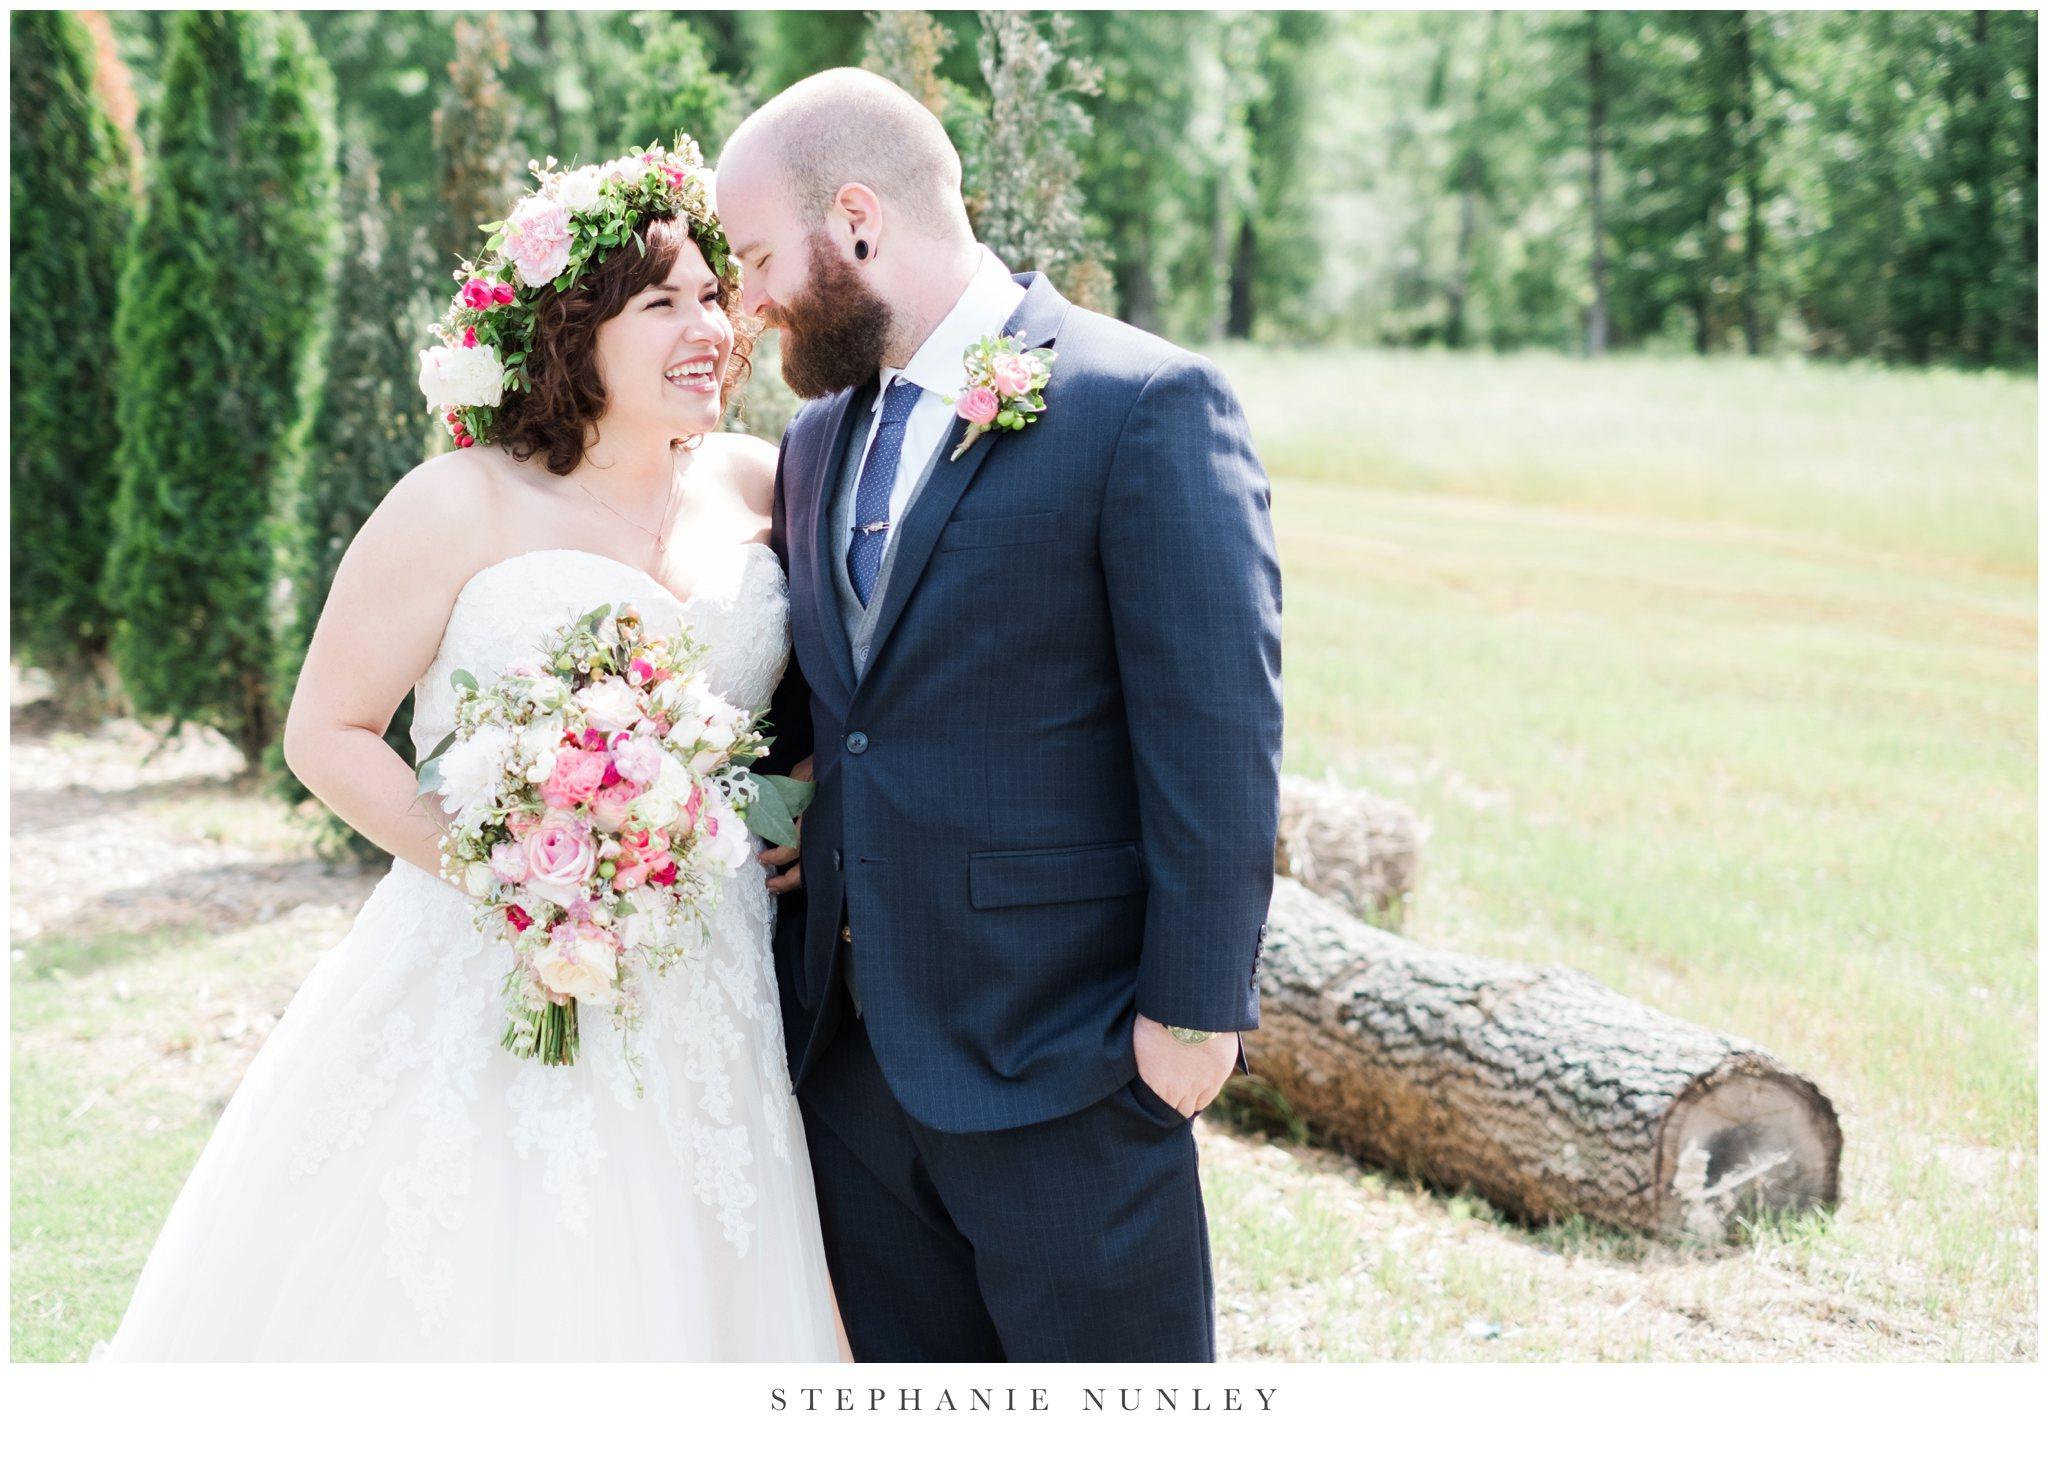 romantic-outdoor-wedding-with-flower-crown-0075.jpg